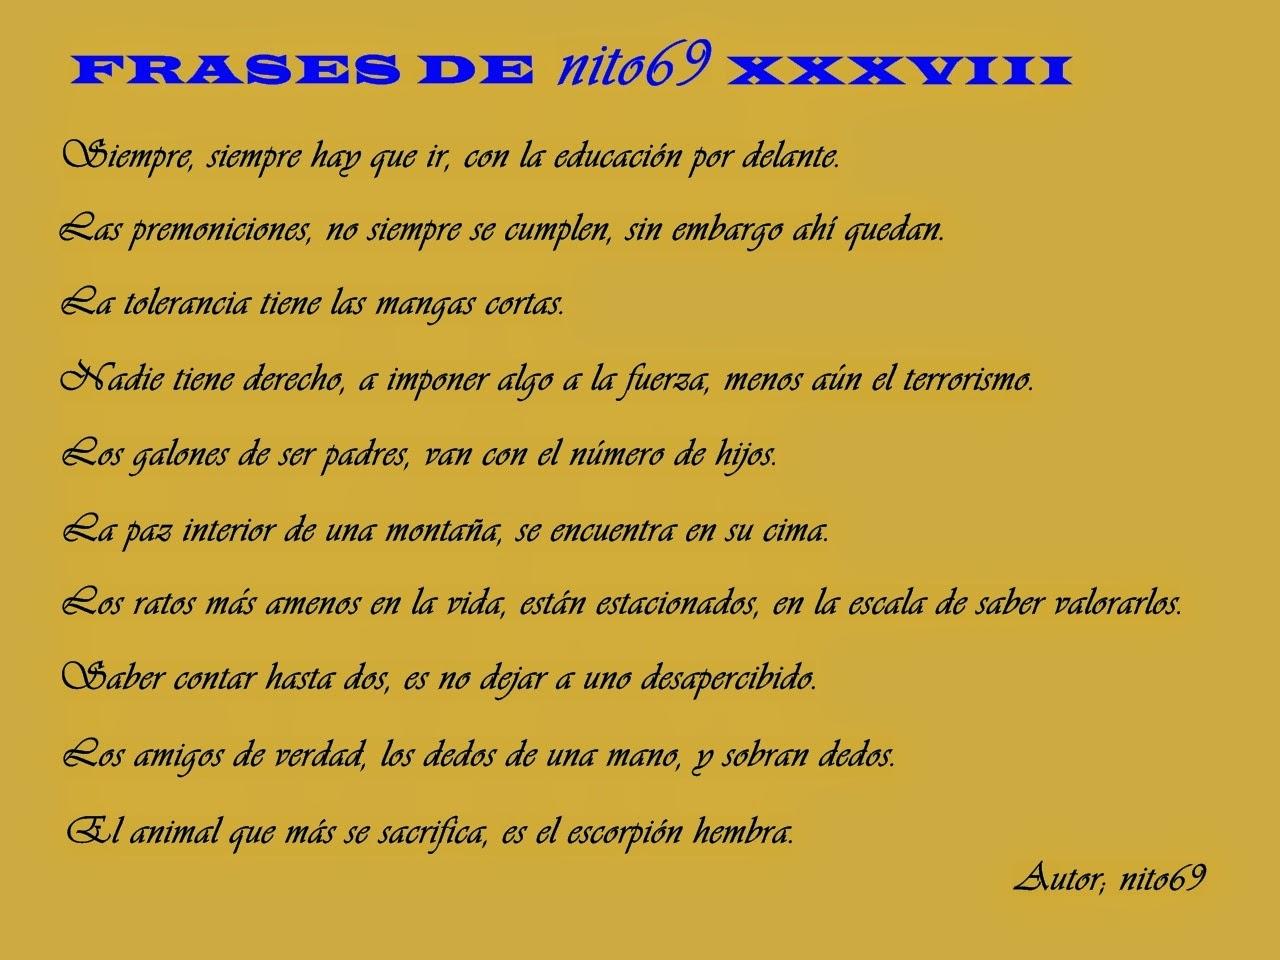 FRASES DE nito69 XXXVIII